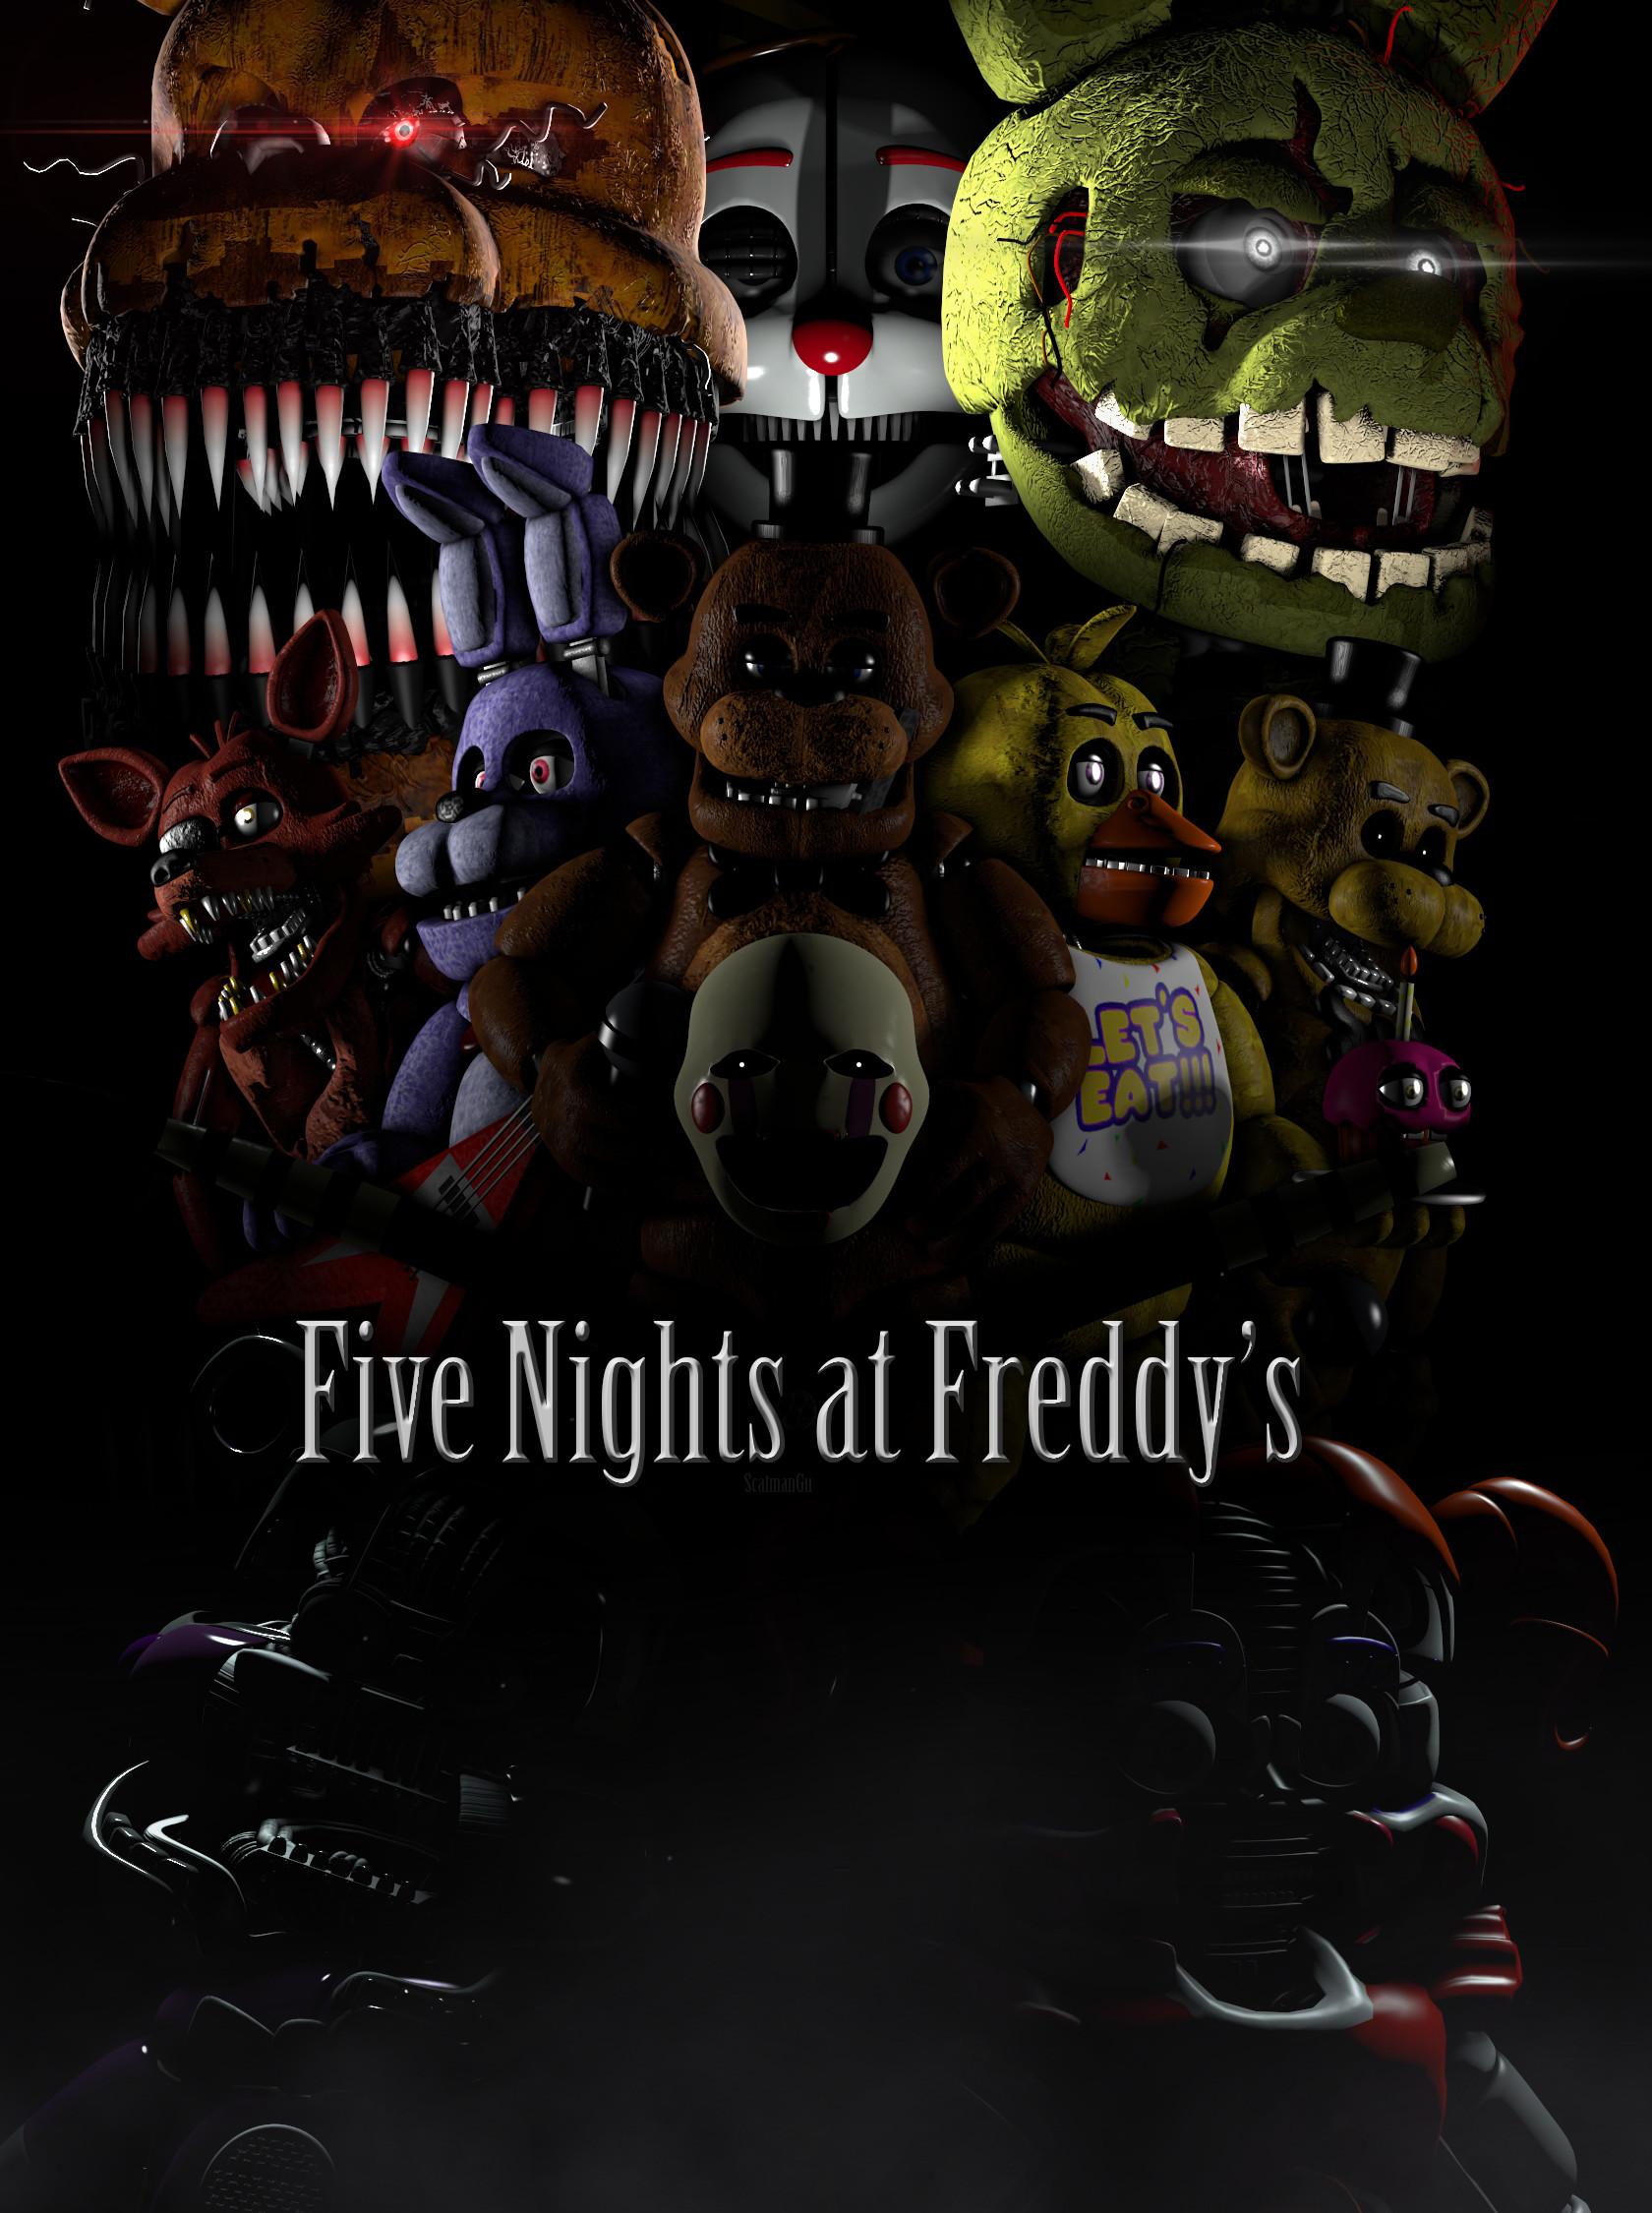 Res: 1680x2250, Five Nights at Freddy's. (400 wa. special) {SFM} by ScatmanGu